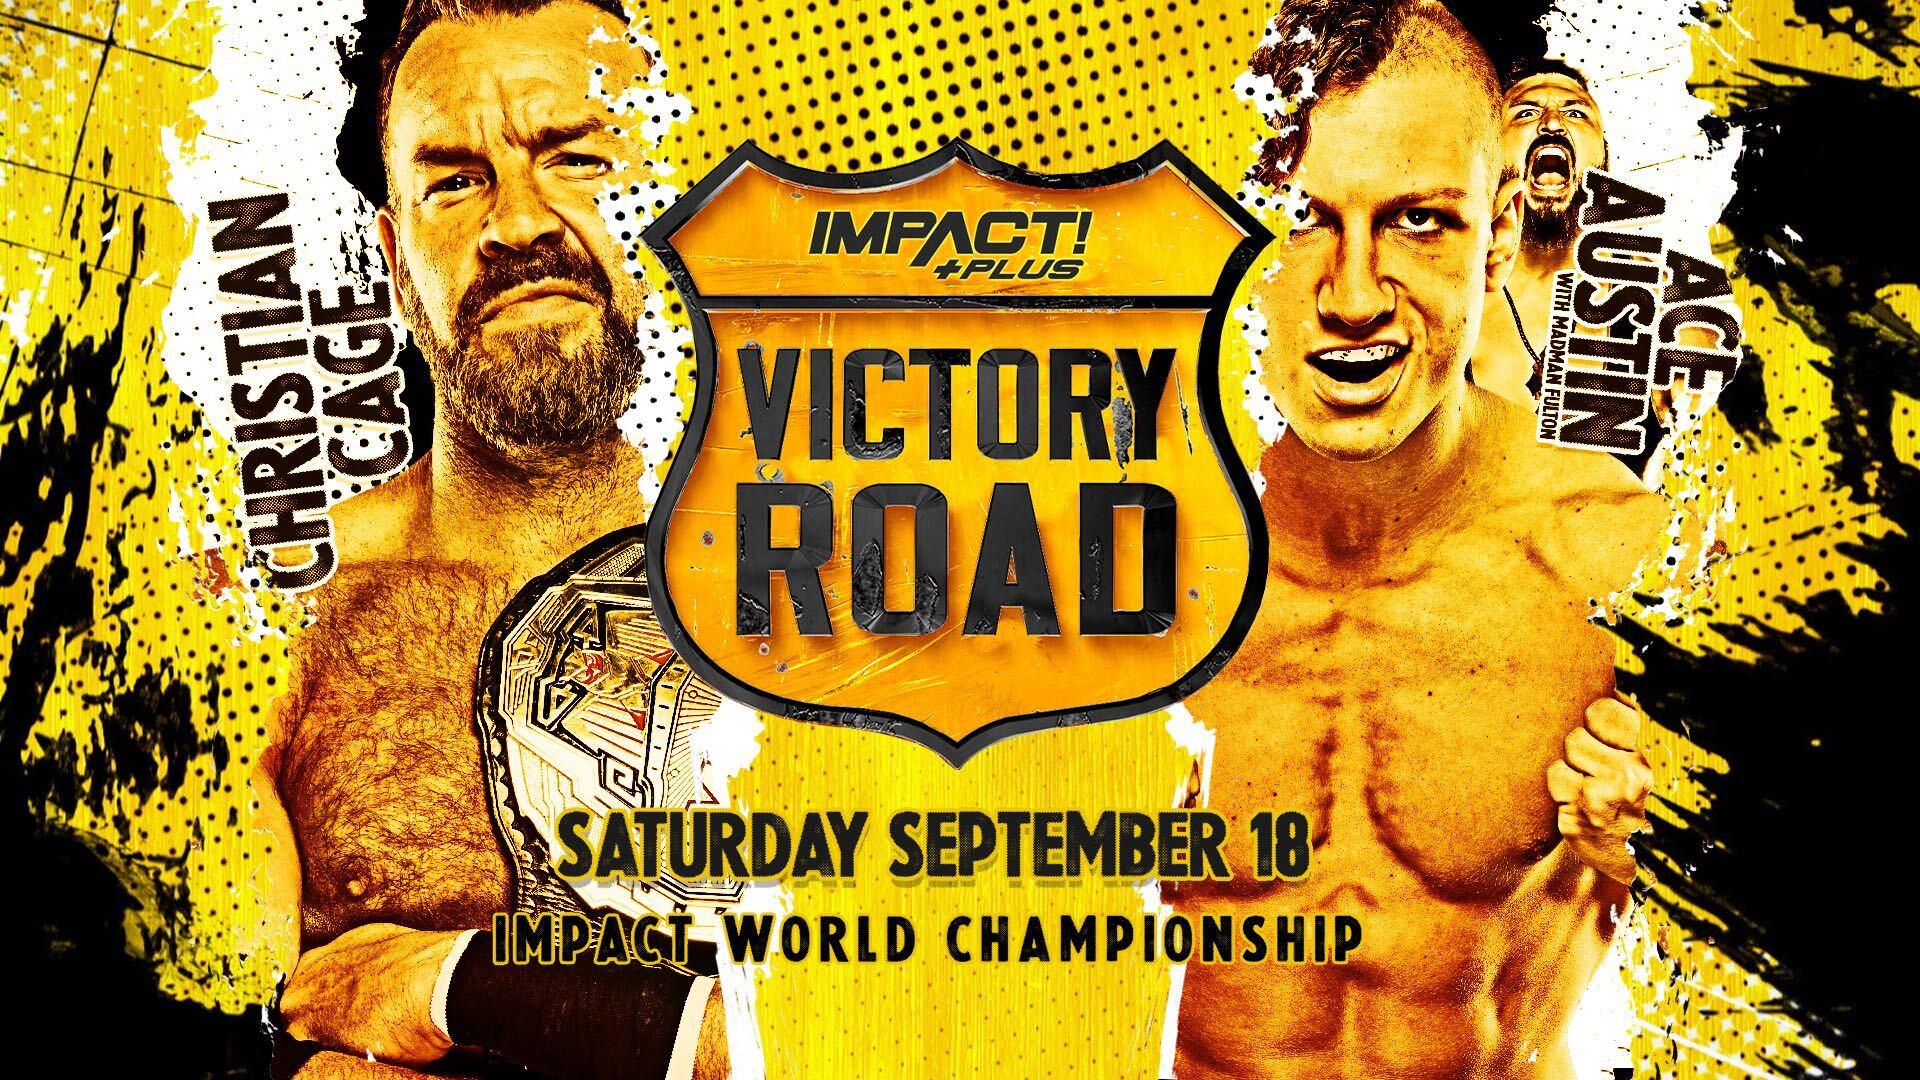 impact world championship victory road